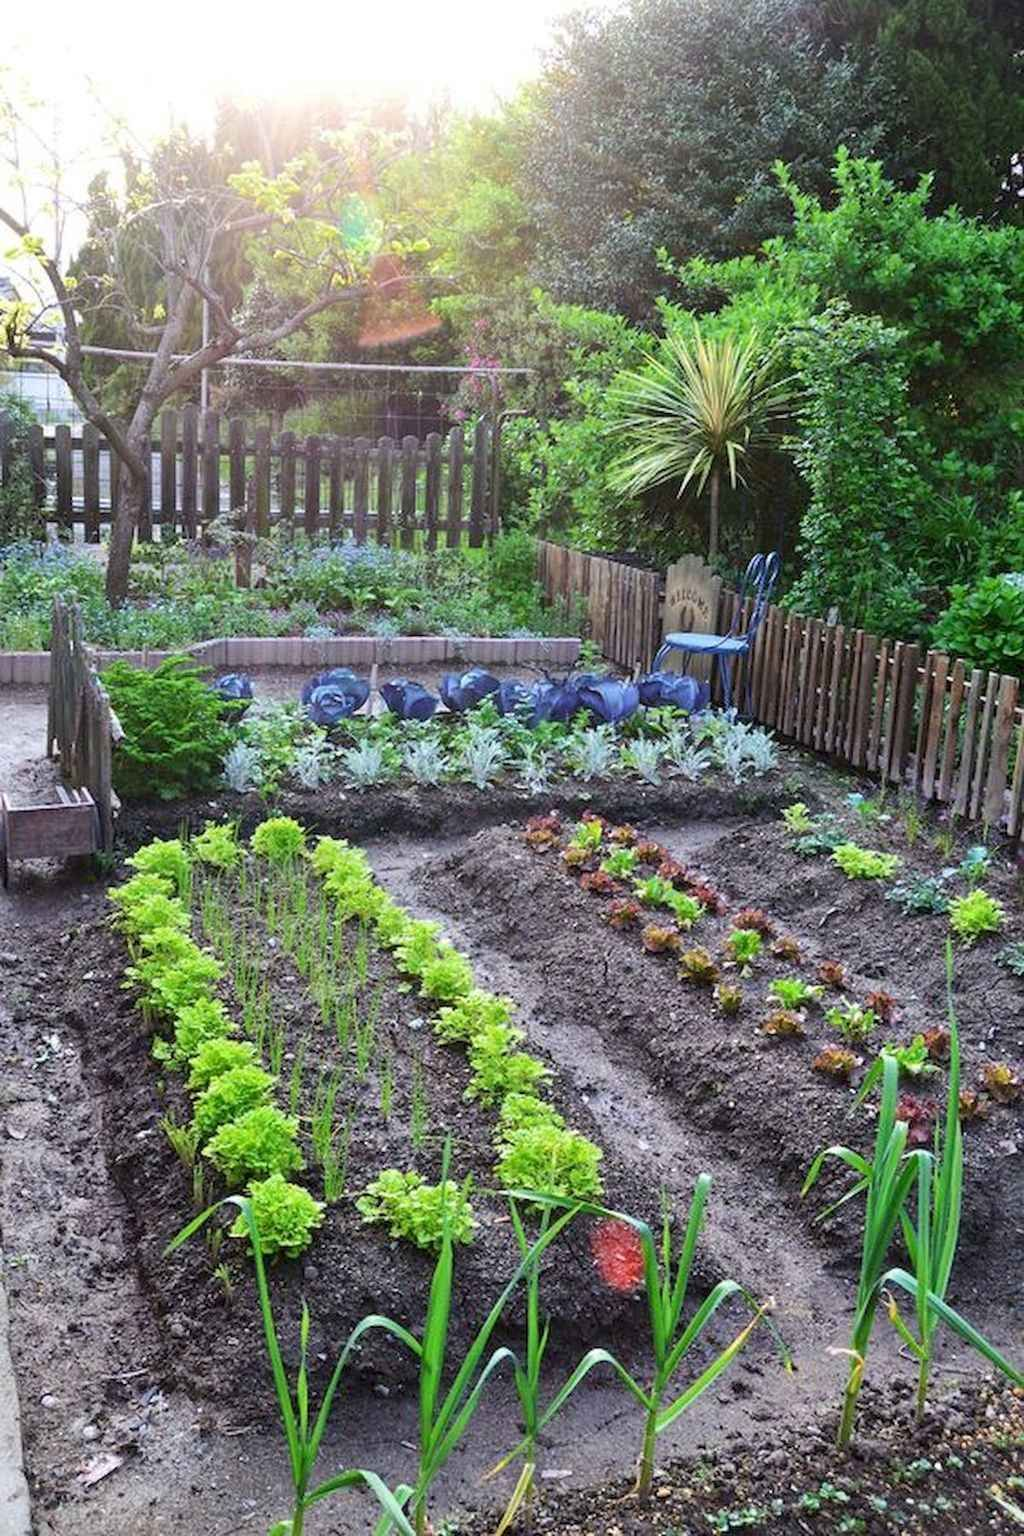 12 Awesome Backyard Vegetable Garden Design Ideas Structhome Com Garden Layout Vegetable Garden Design Home Vegetable Garden Backyard vegetable garden how to